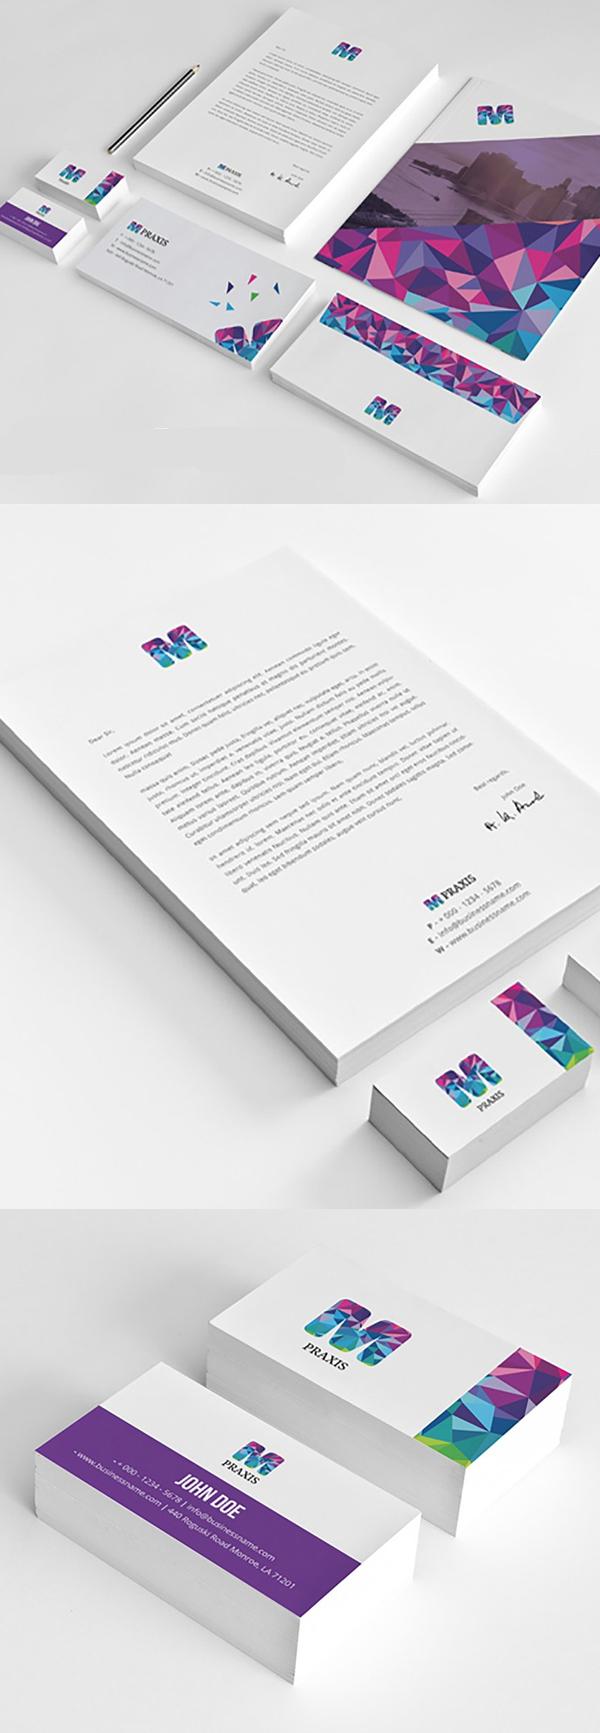 50 Professional Corporate Branding / Stationery Templates Design - 6